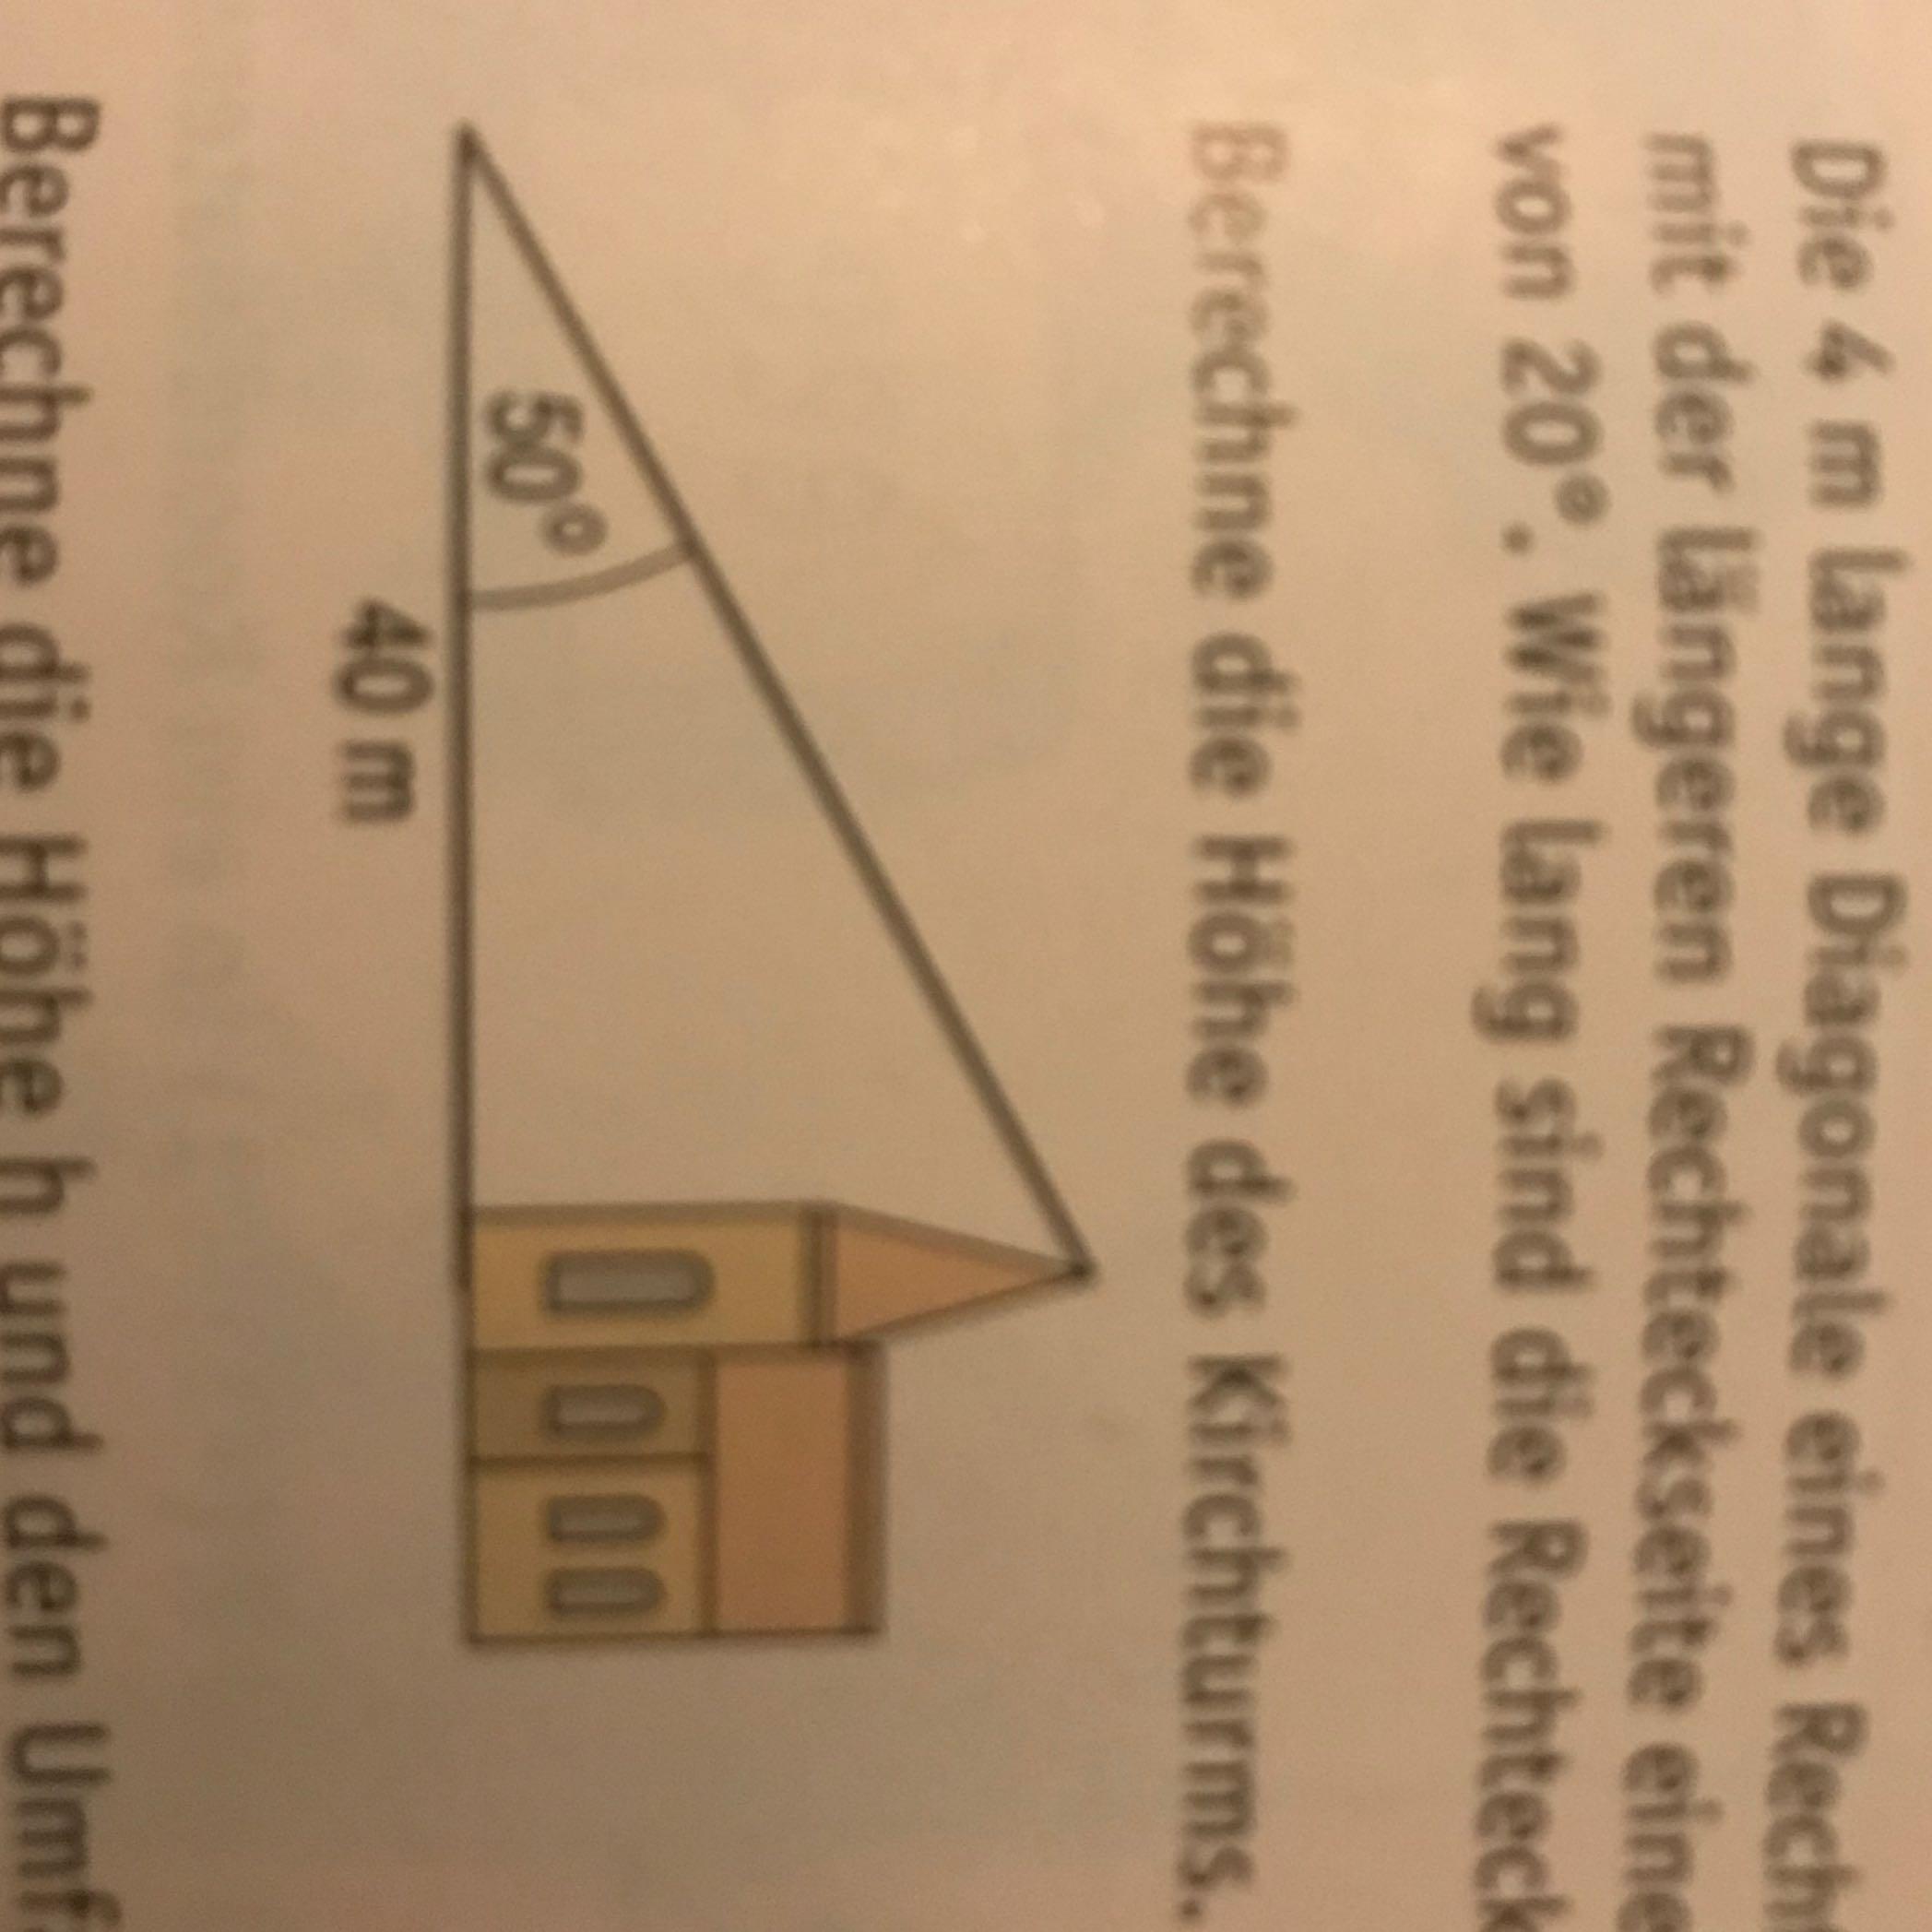 tangens berechnen in mathe trigonometrie schule lehrer. Black Bedroom Furniture Sets. Home Design Ideas